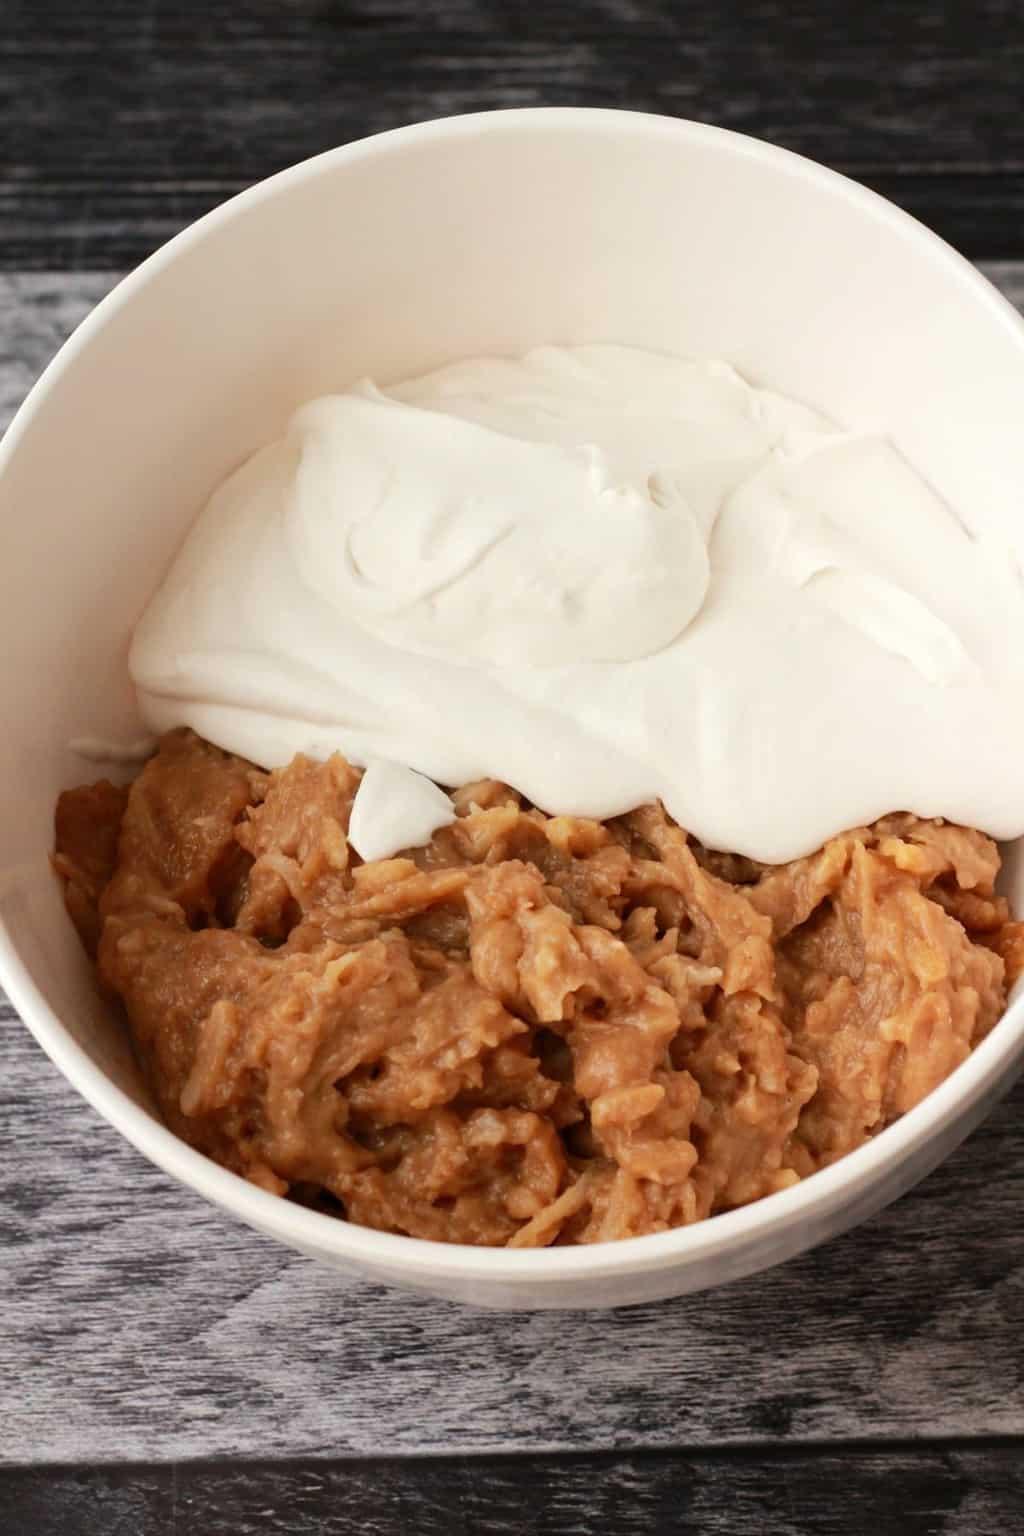 Making a Vegan Coconut Cream Pie #vegan #lovingitvegan #dessert #pie #dairyfree #glutenfree